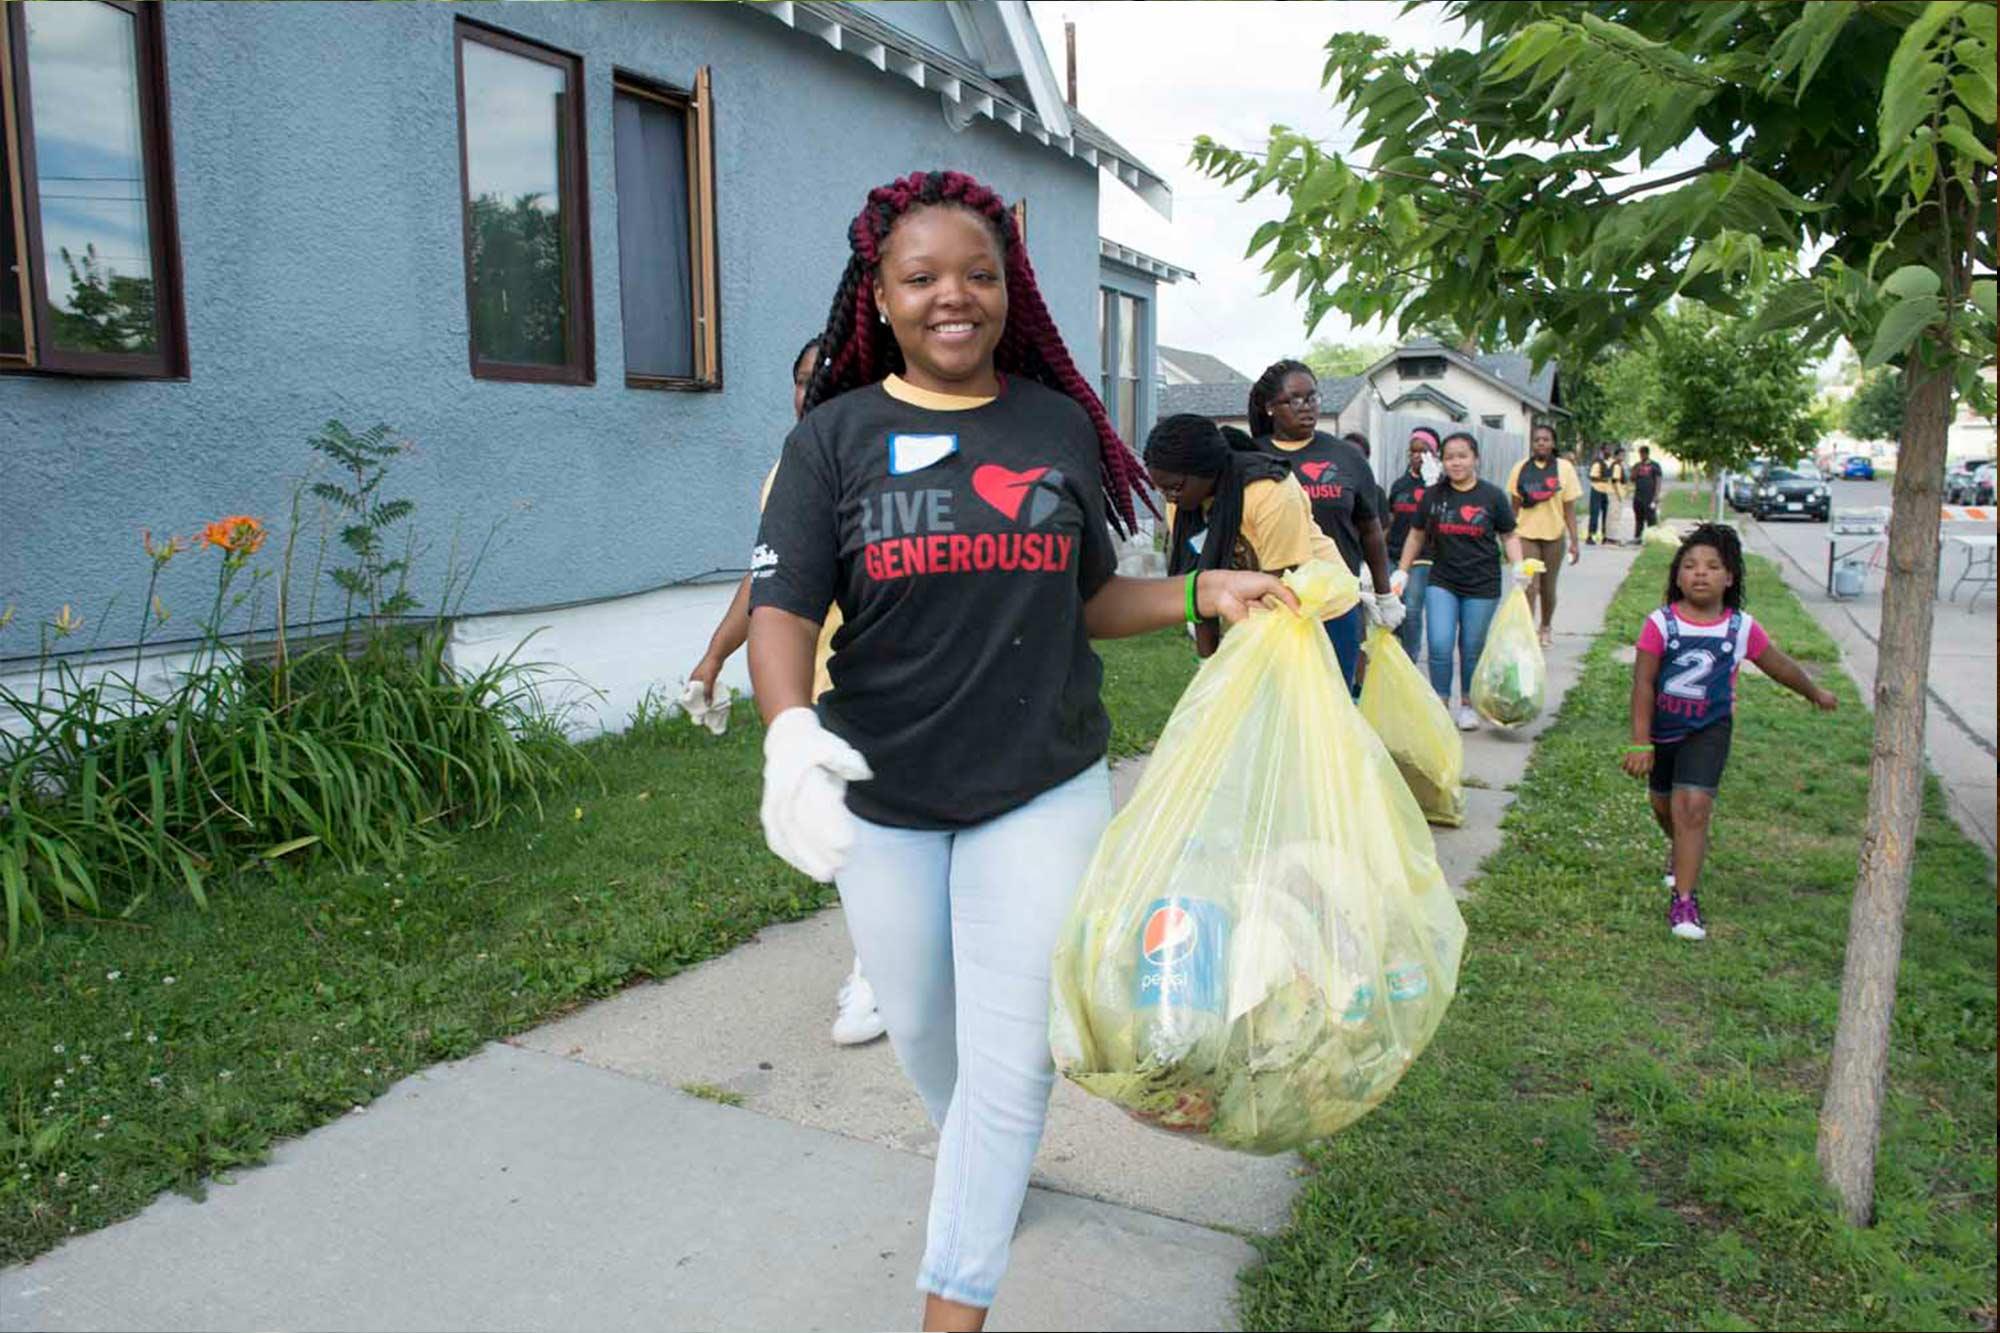 Jordan week of kindness participant carrying a bag of trash